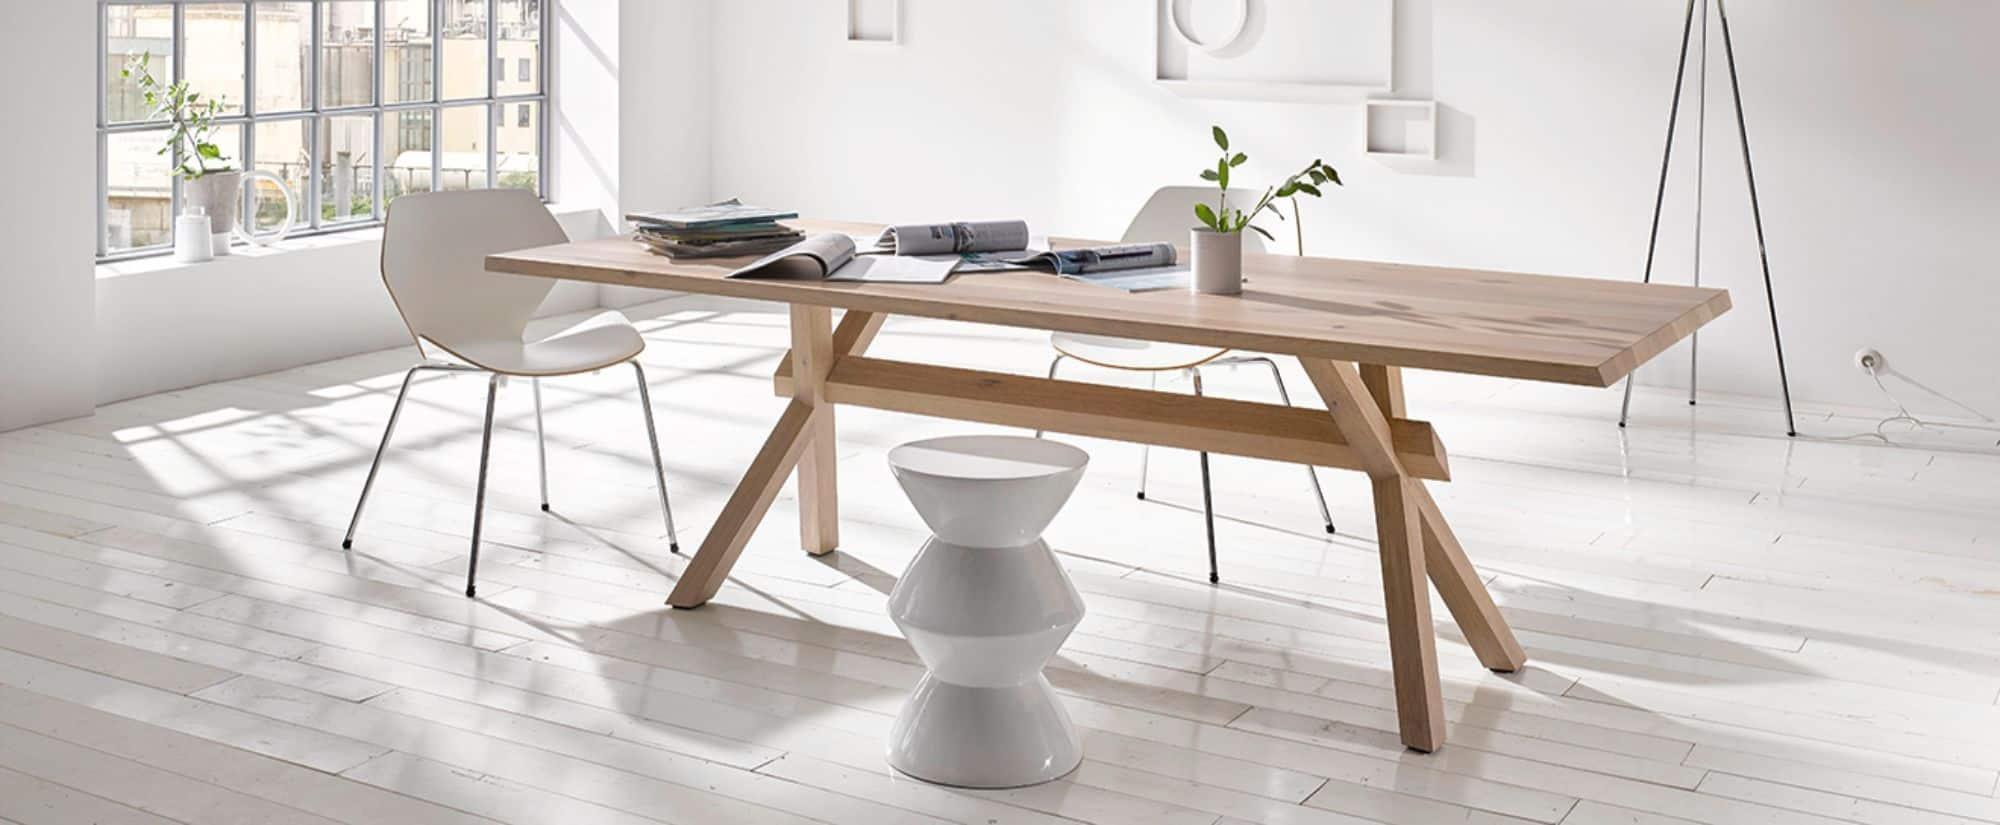 KFF solid wood table